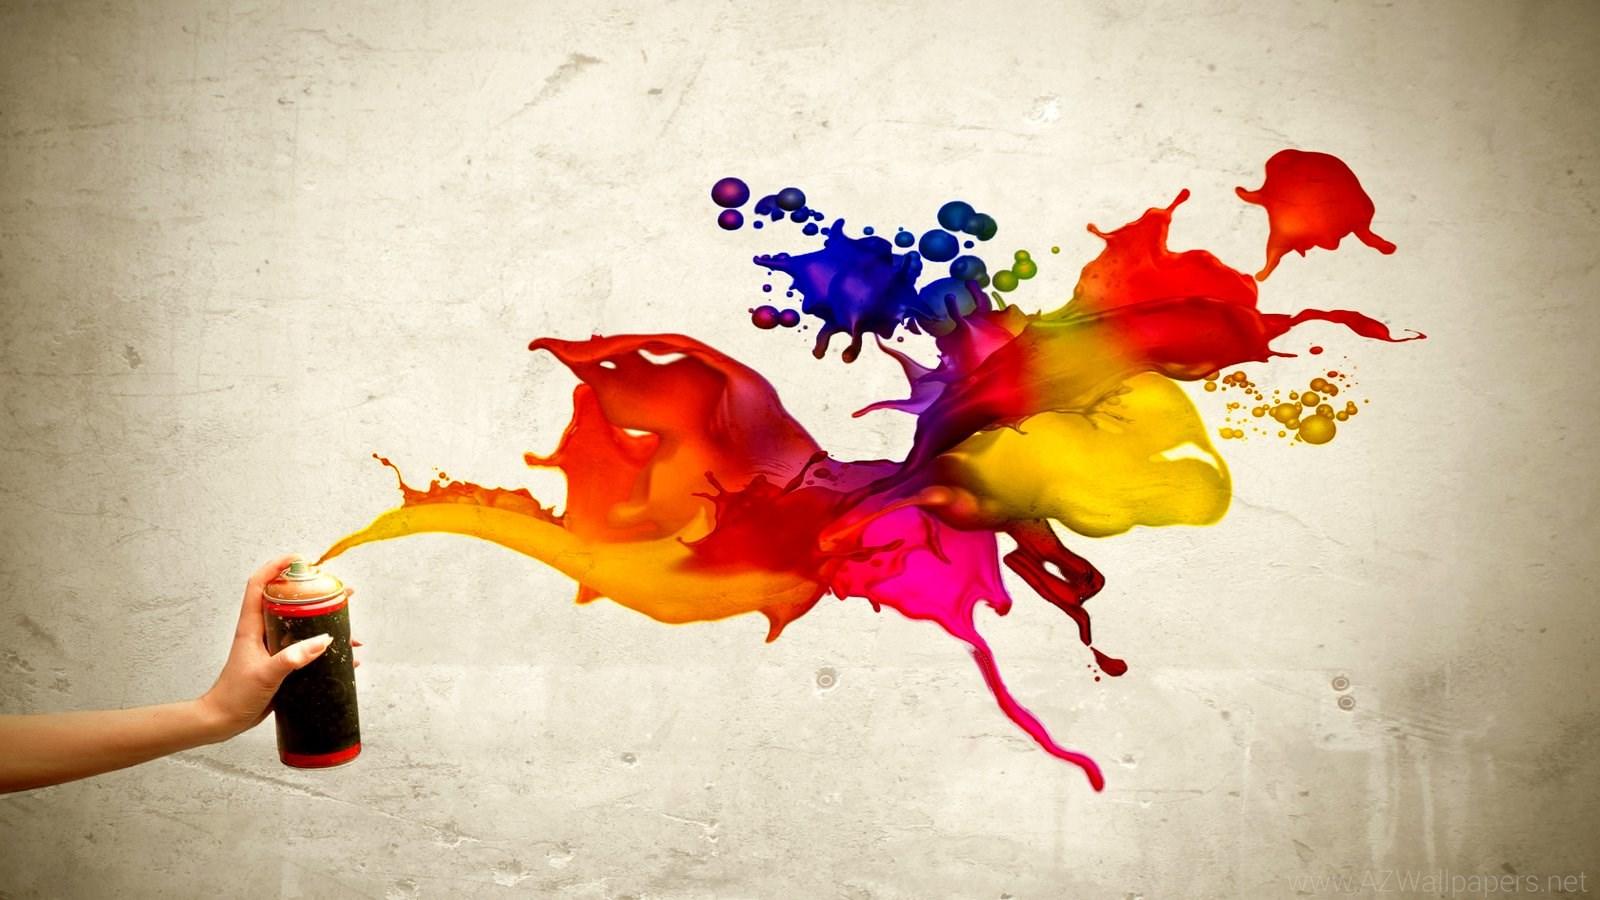 Free Download Desktop Hd Wallpapers Beautiful Wallpapers Hd